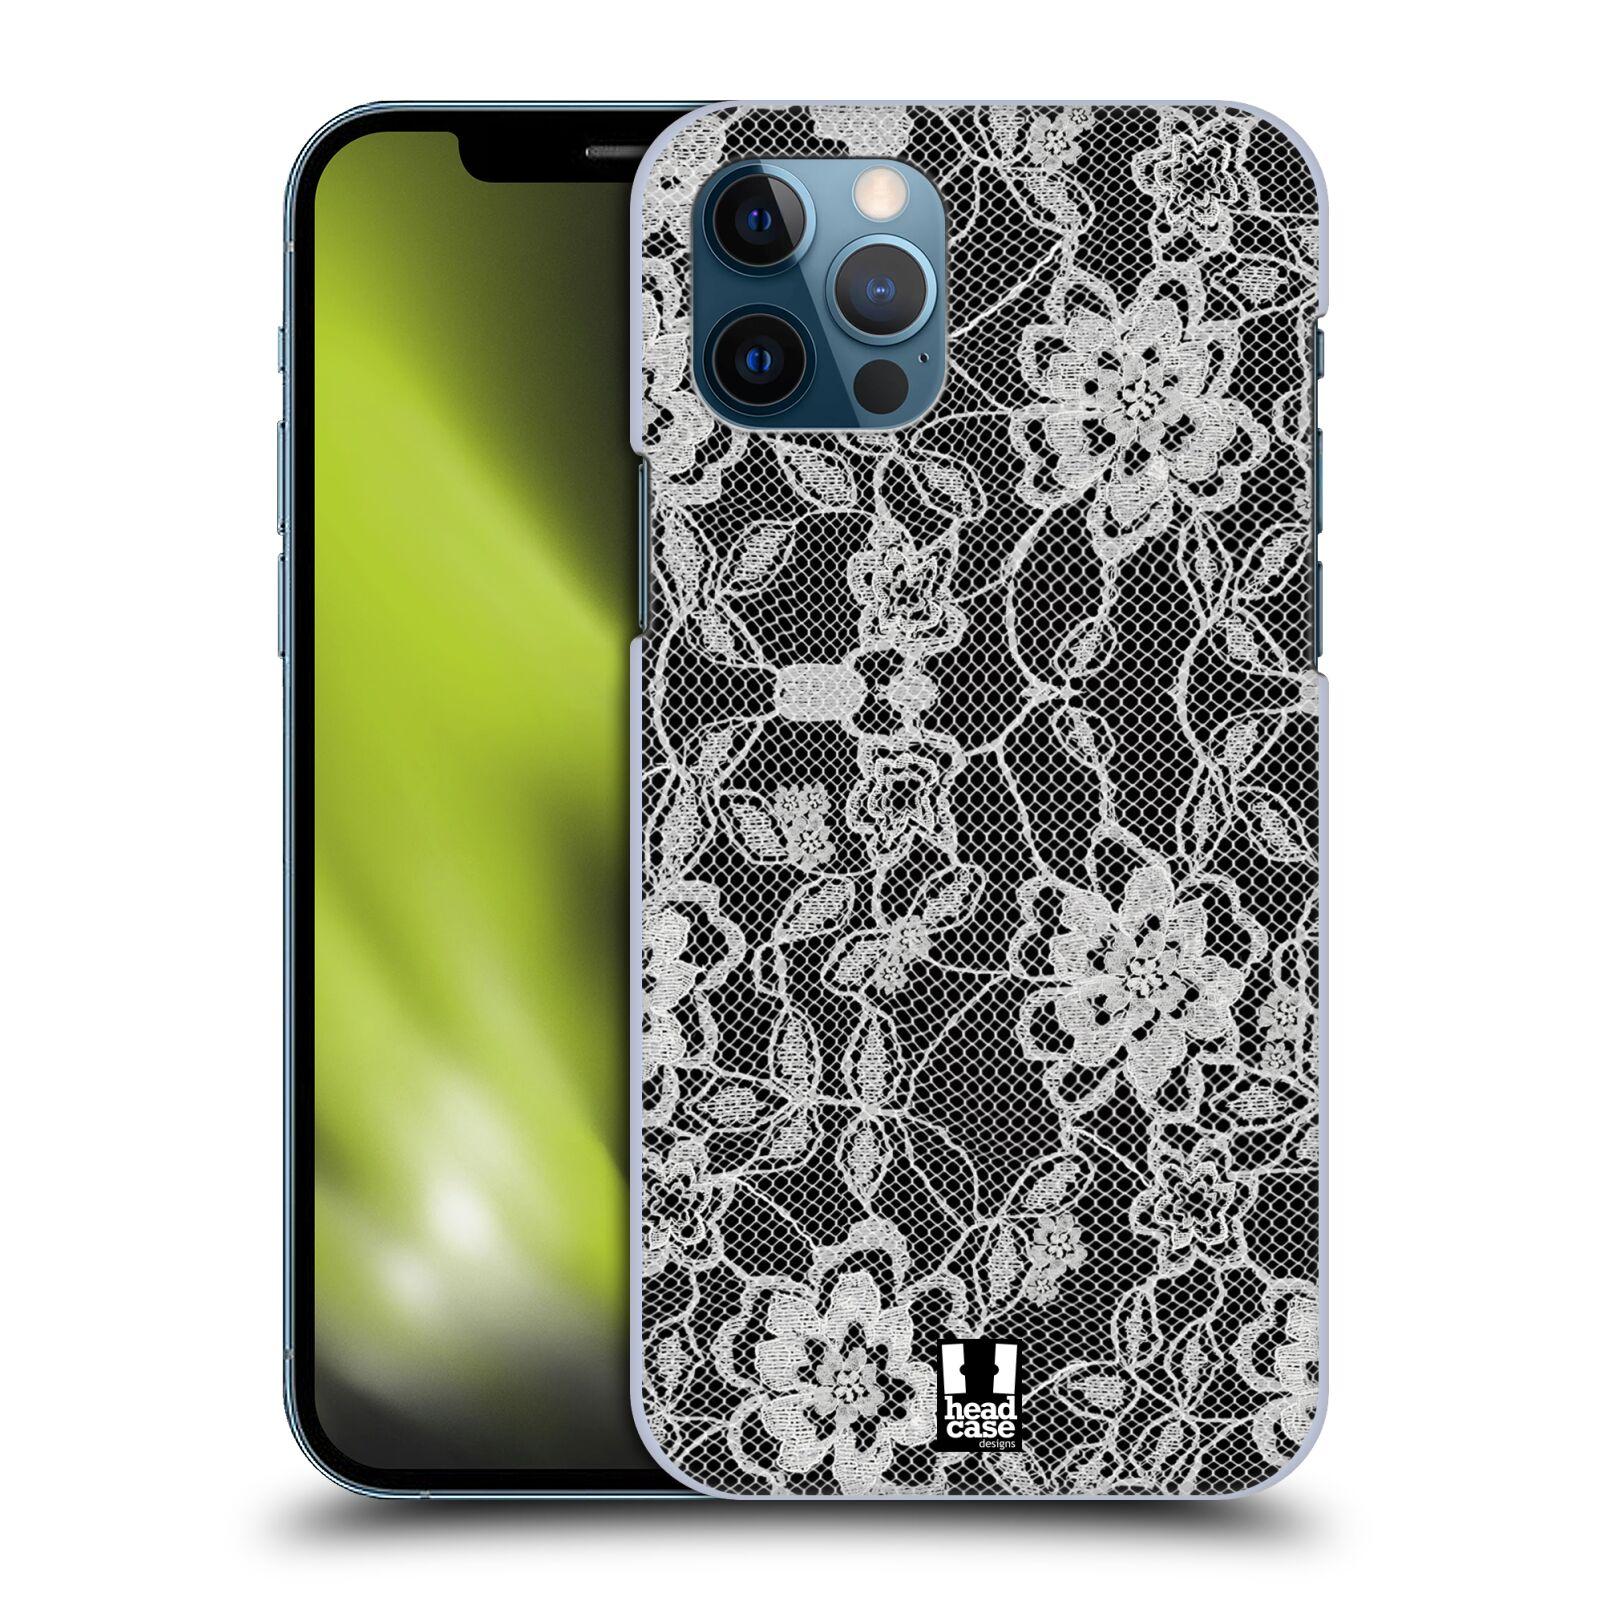 Plastové pouzdro na mobil Apple iPhone 12 / 12 Pro - Head Case - FLOWERY KRAJKA